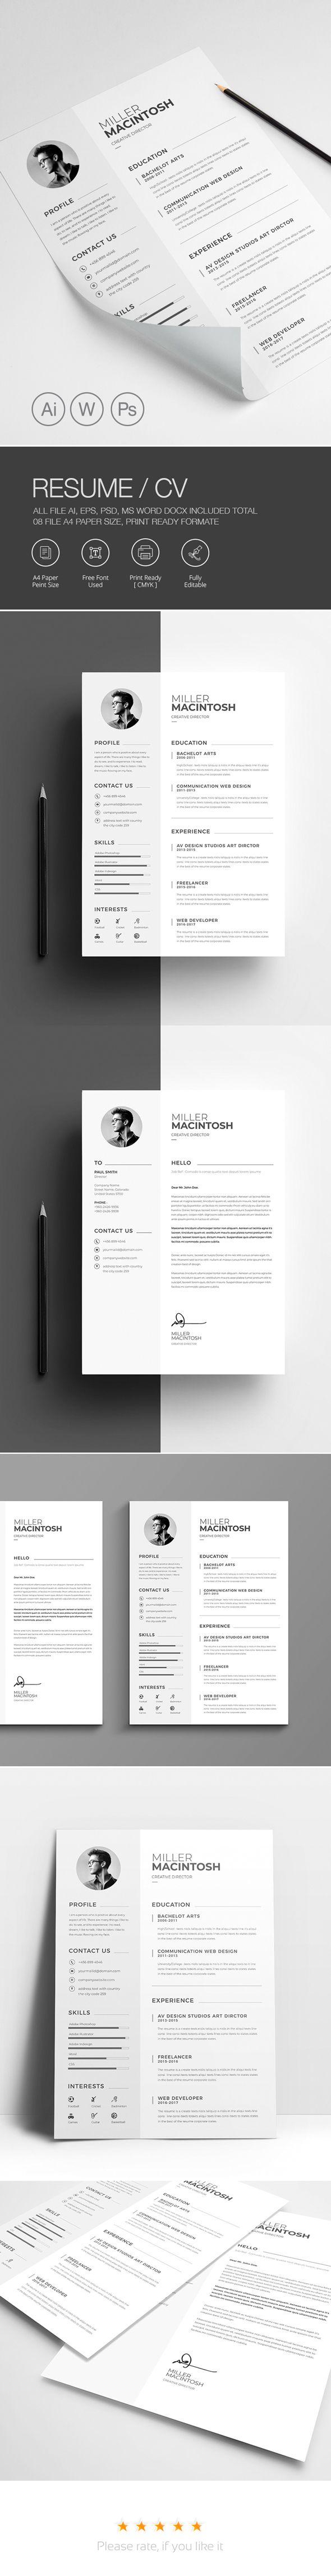 Minimal Creative Word Resume Template on Behance